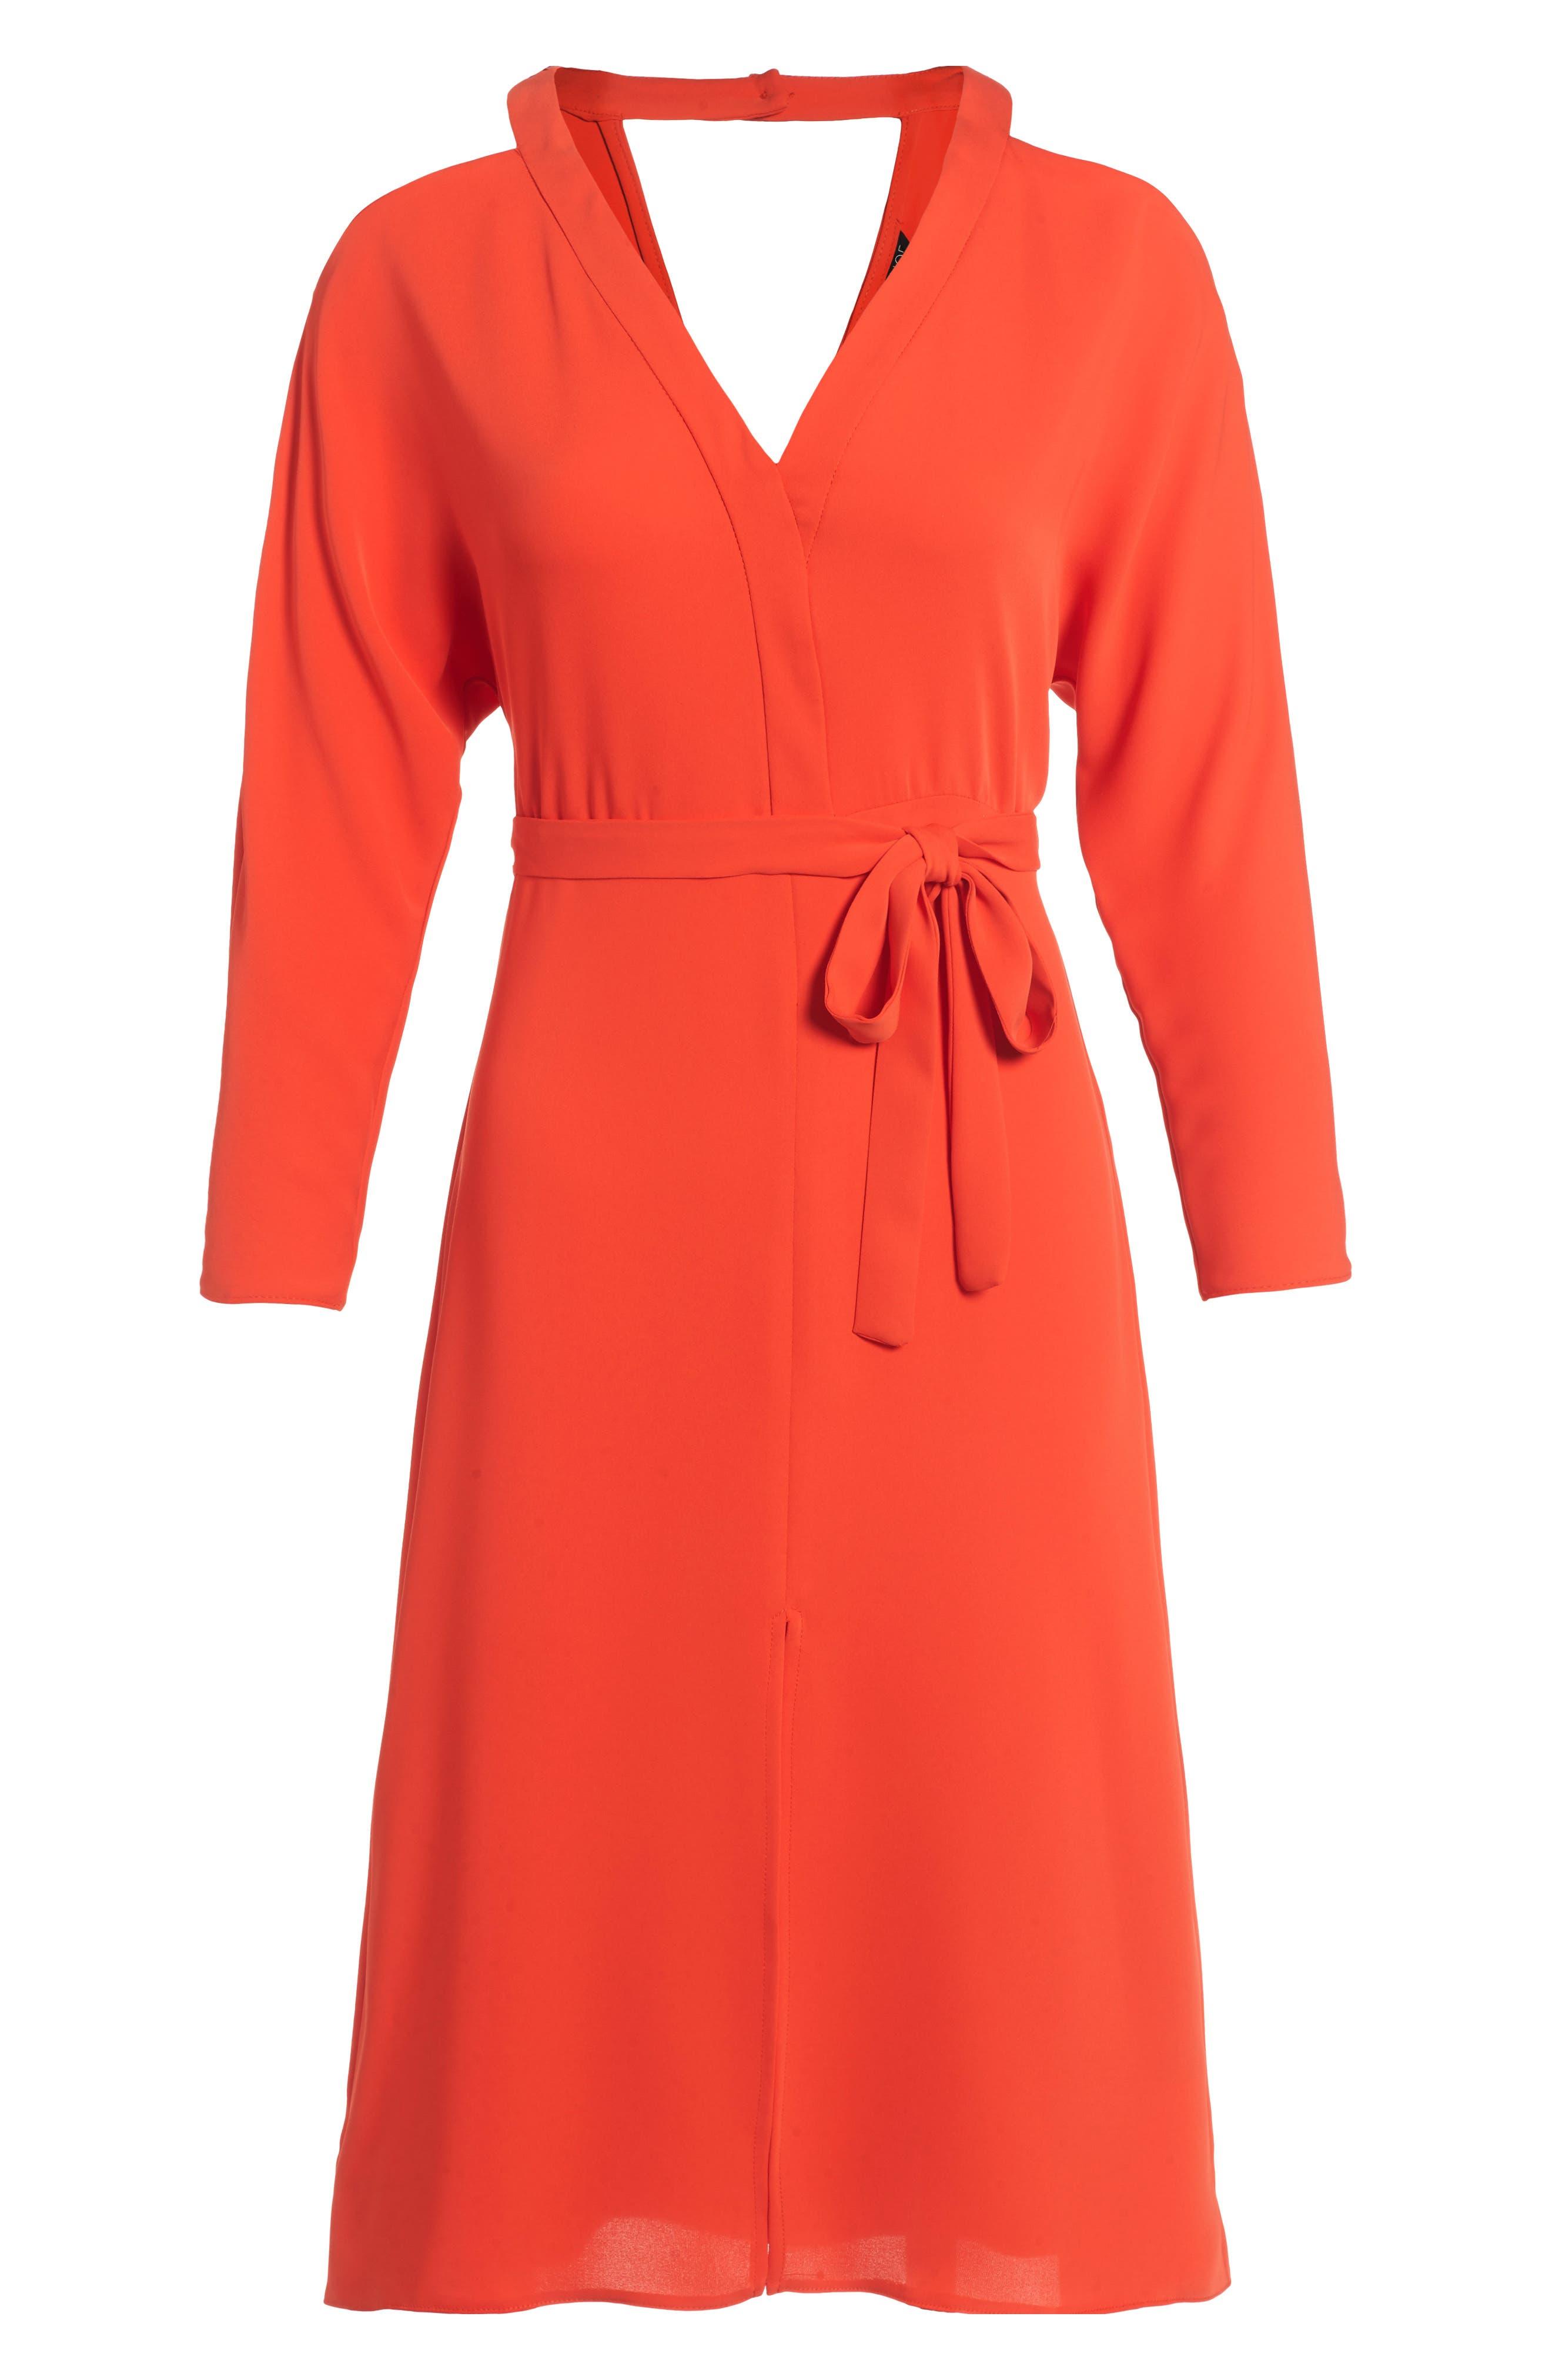 Alternate Image 1 Selected - Topshop Cutout Cold Shoulder Dress